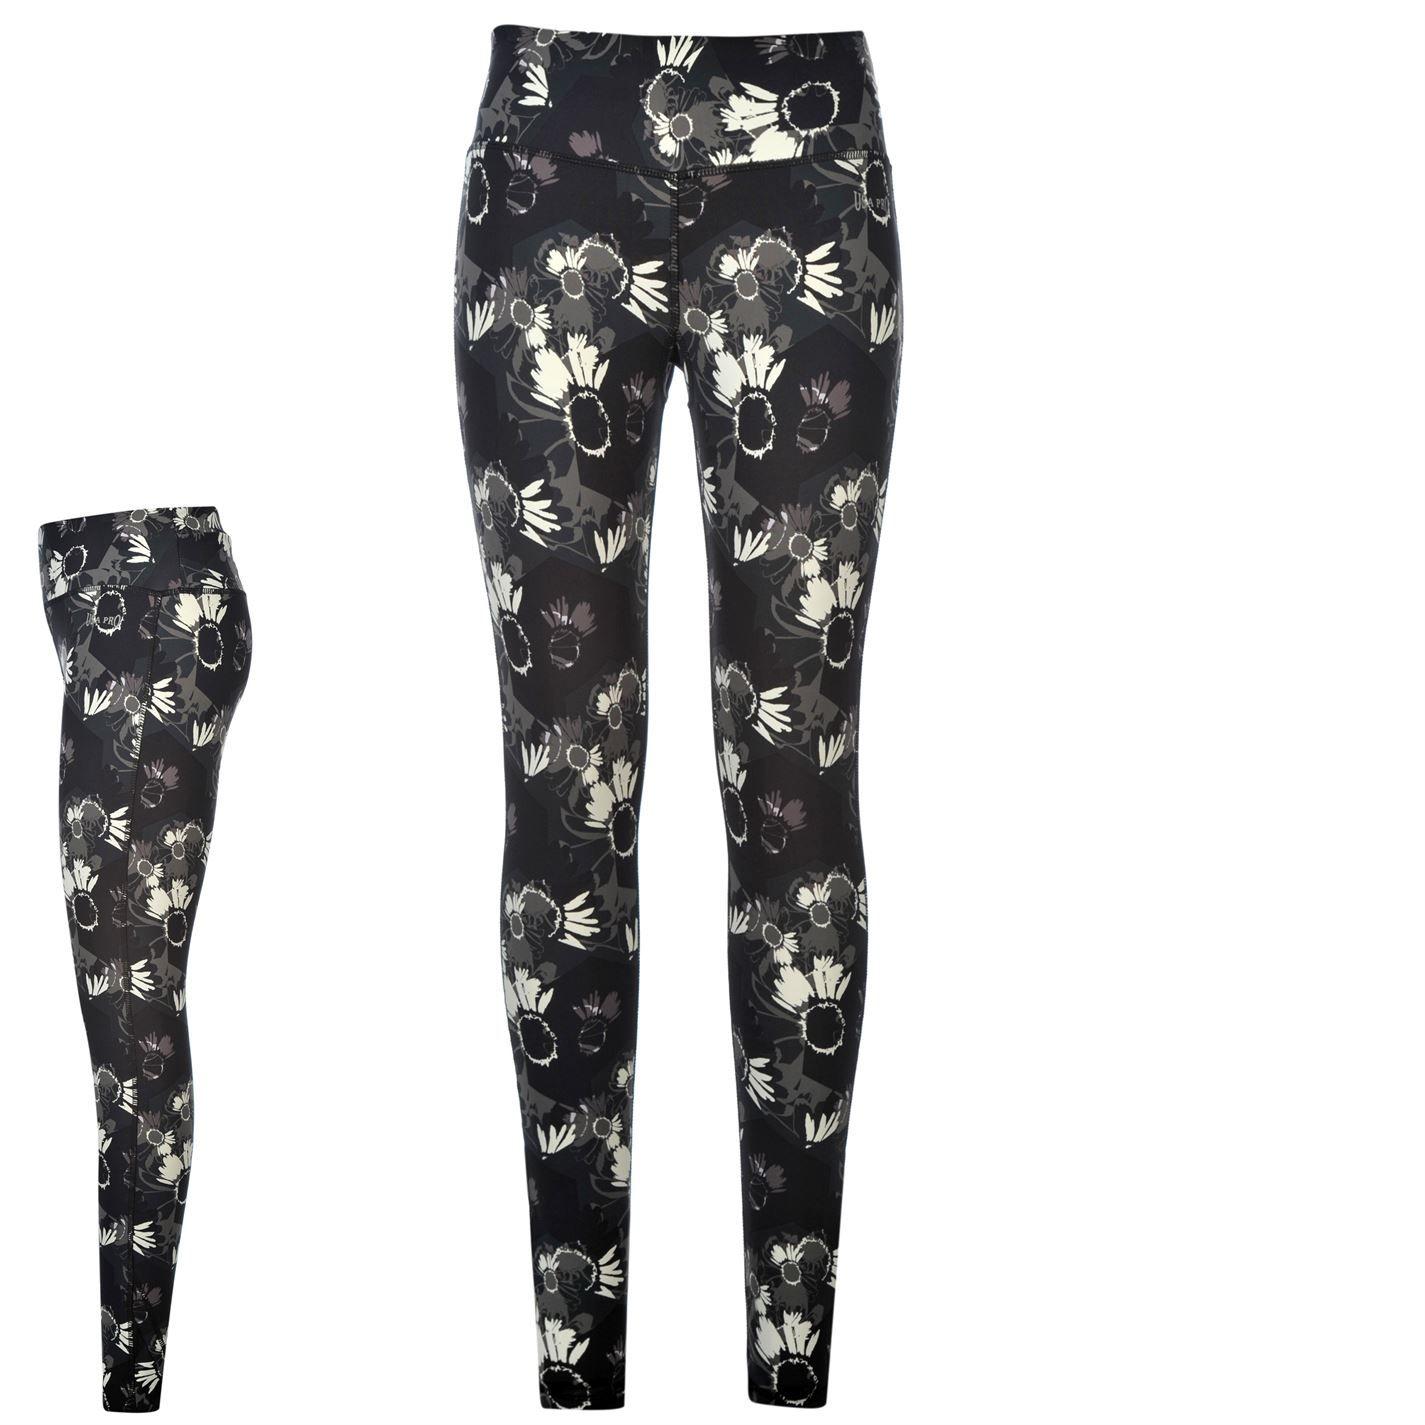 Tight Pants Ladies Pants for women, Workout pants women